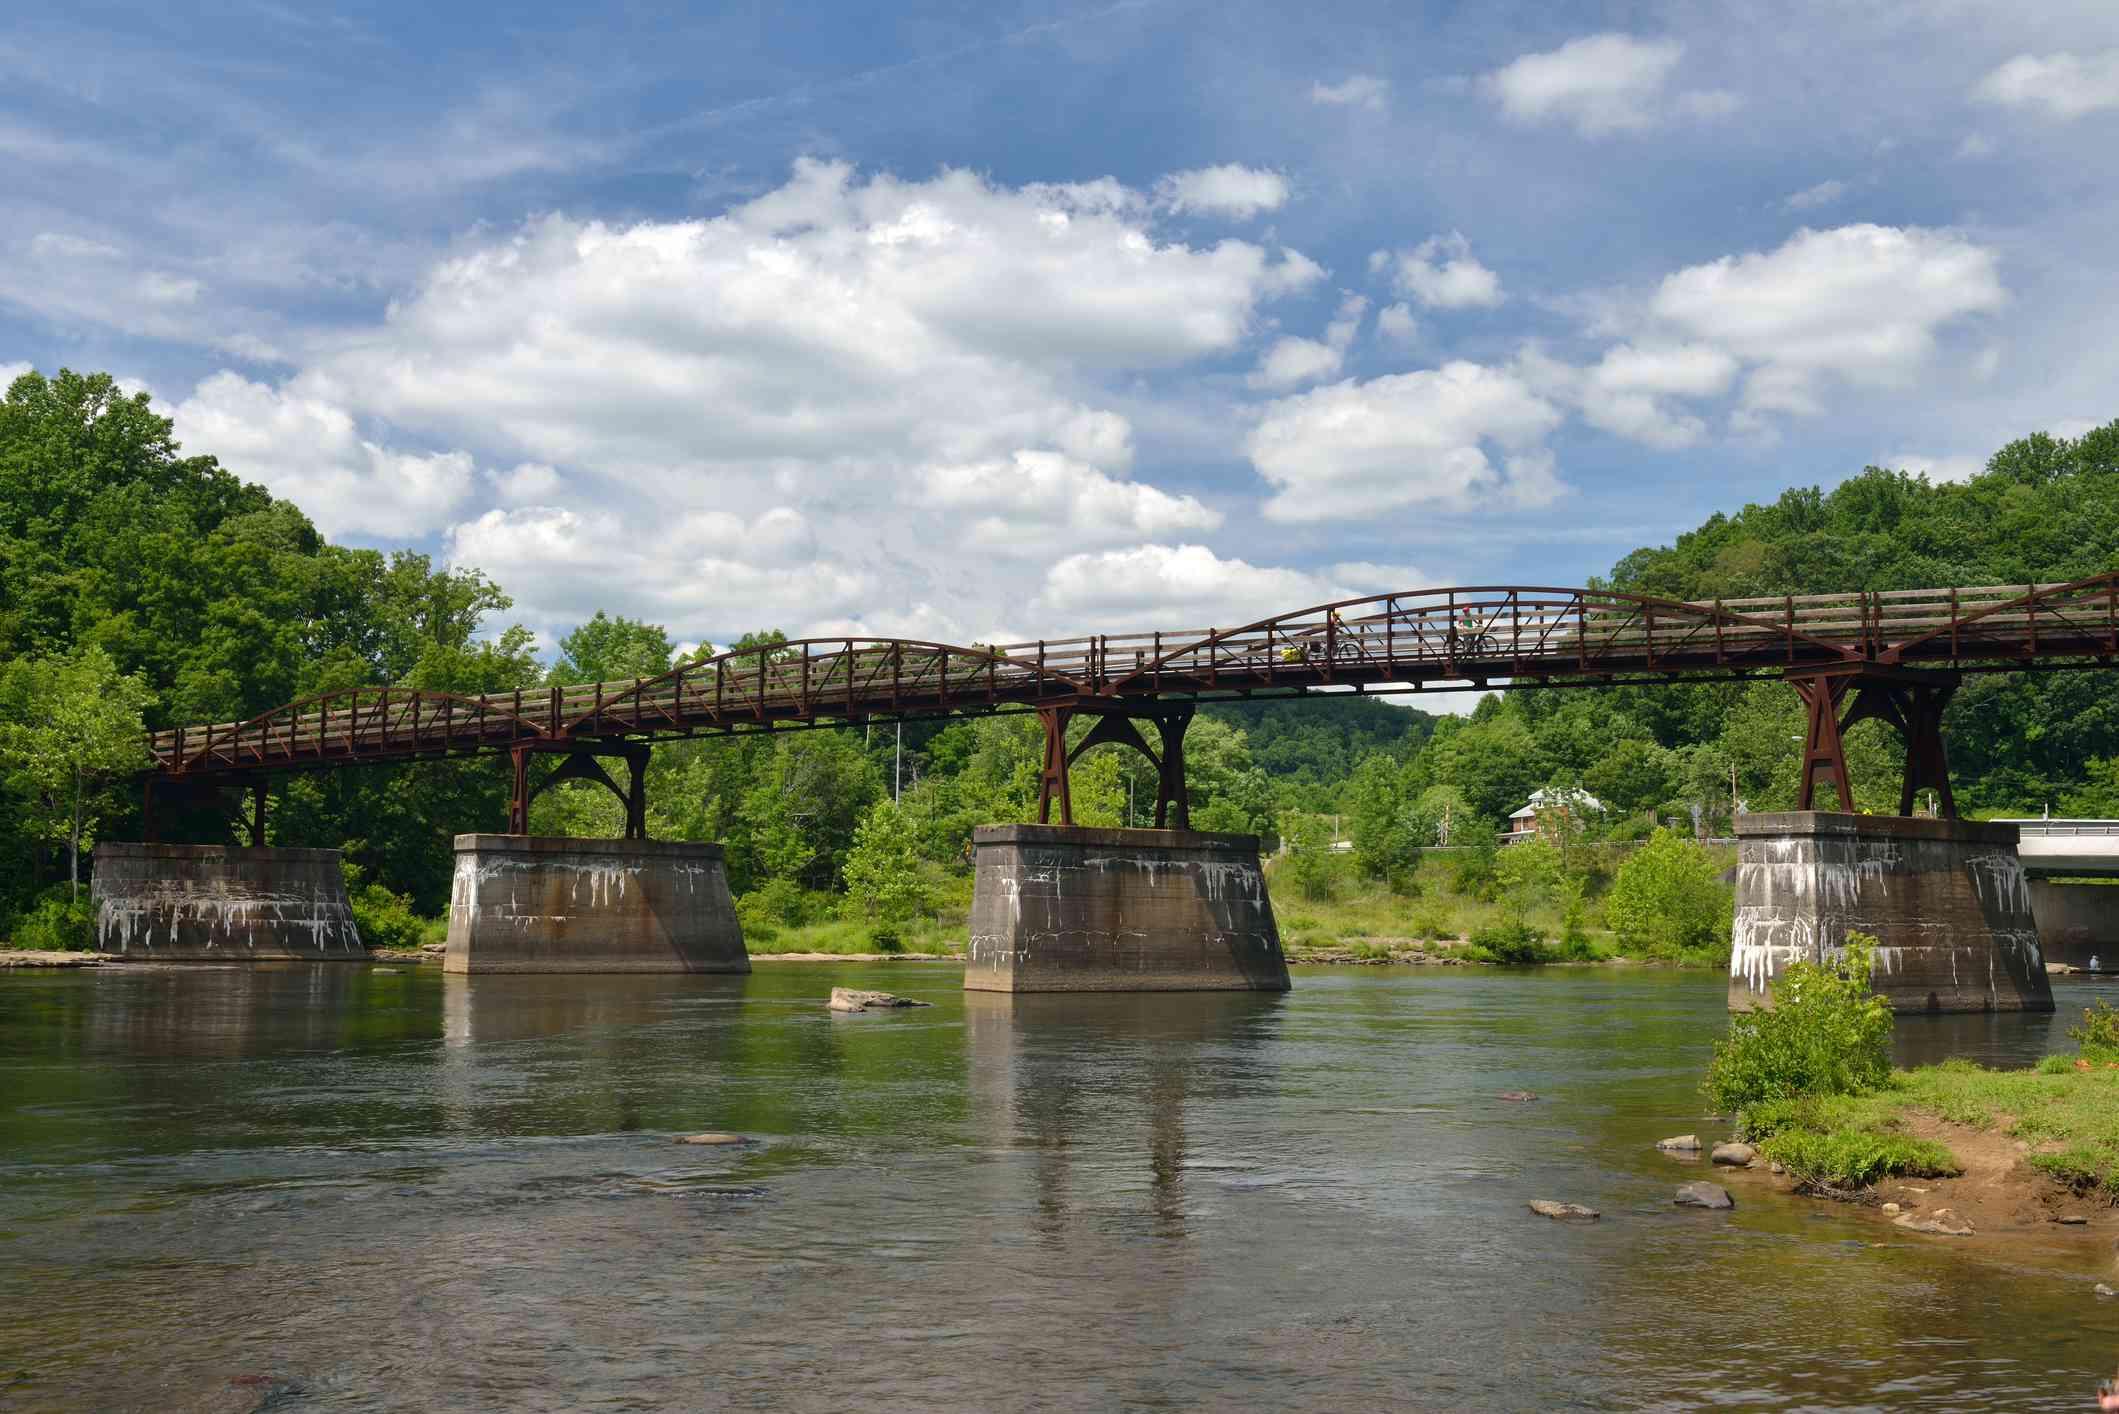 Bridge over Scenic Youghiogheny River